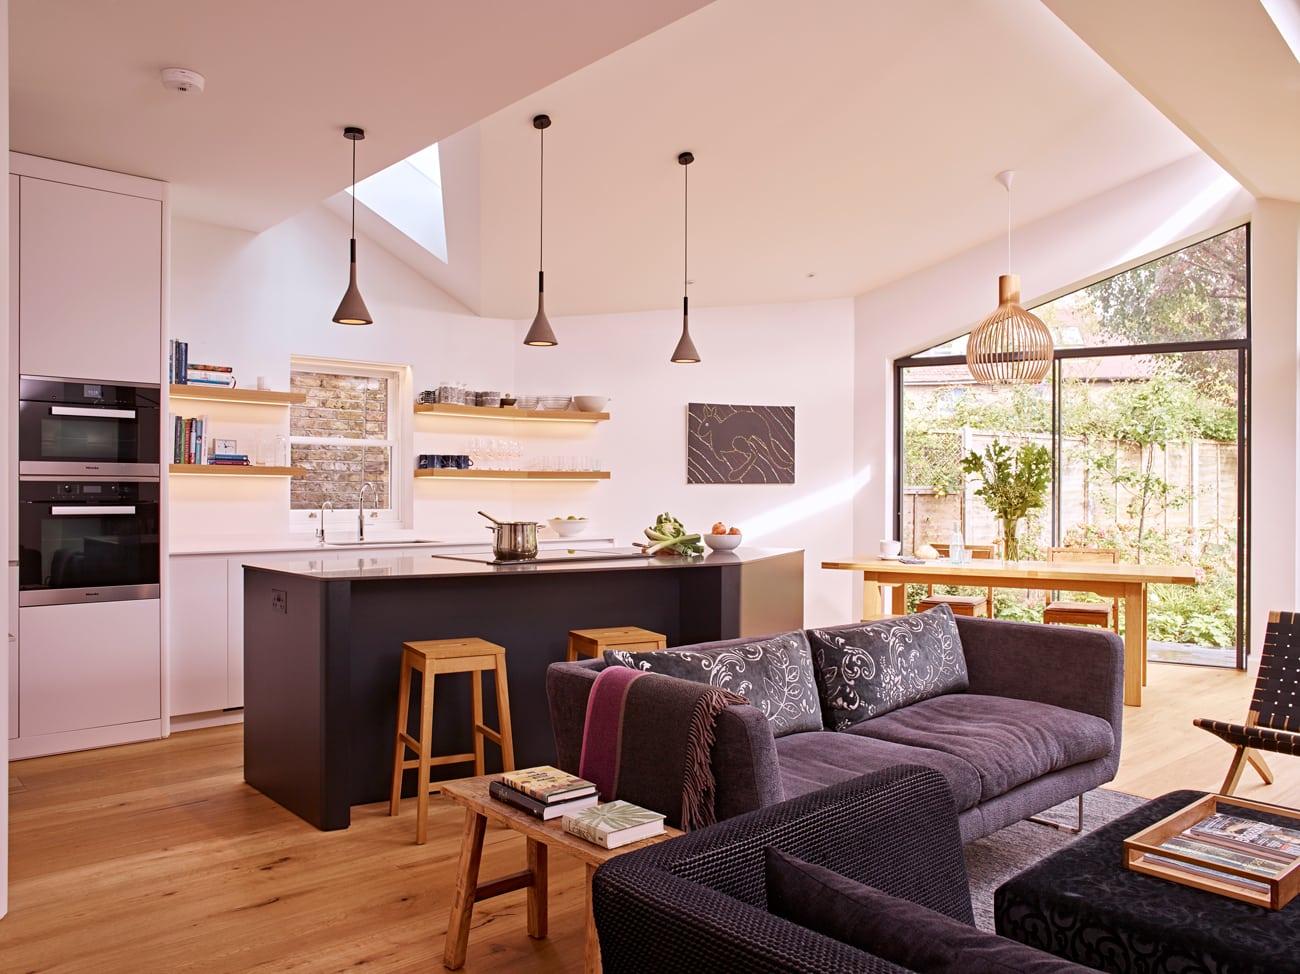 Viers open-plan kitchen extension concept